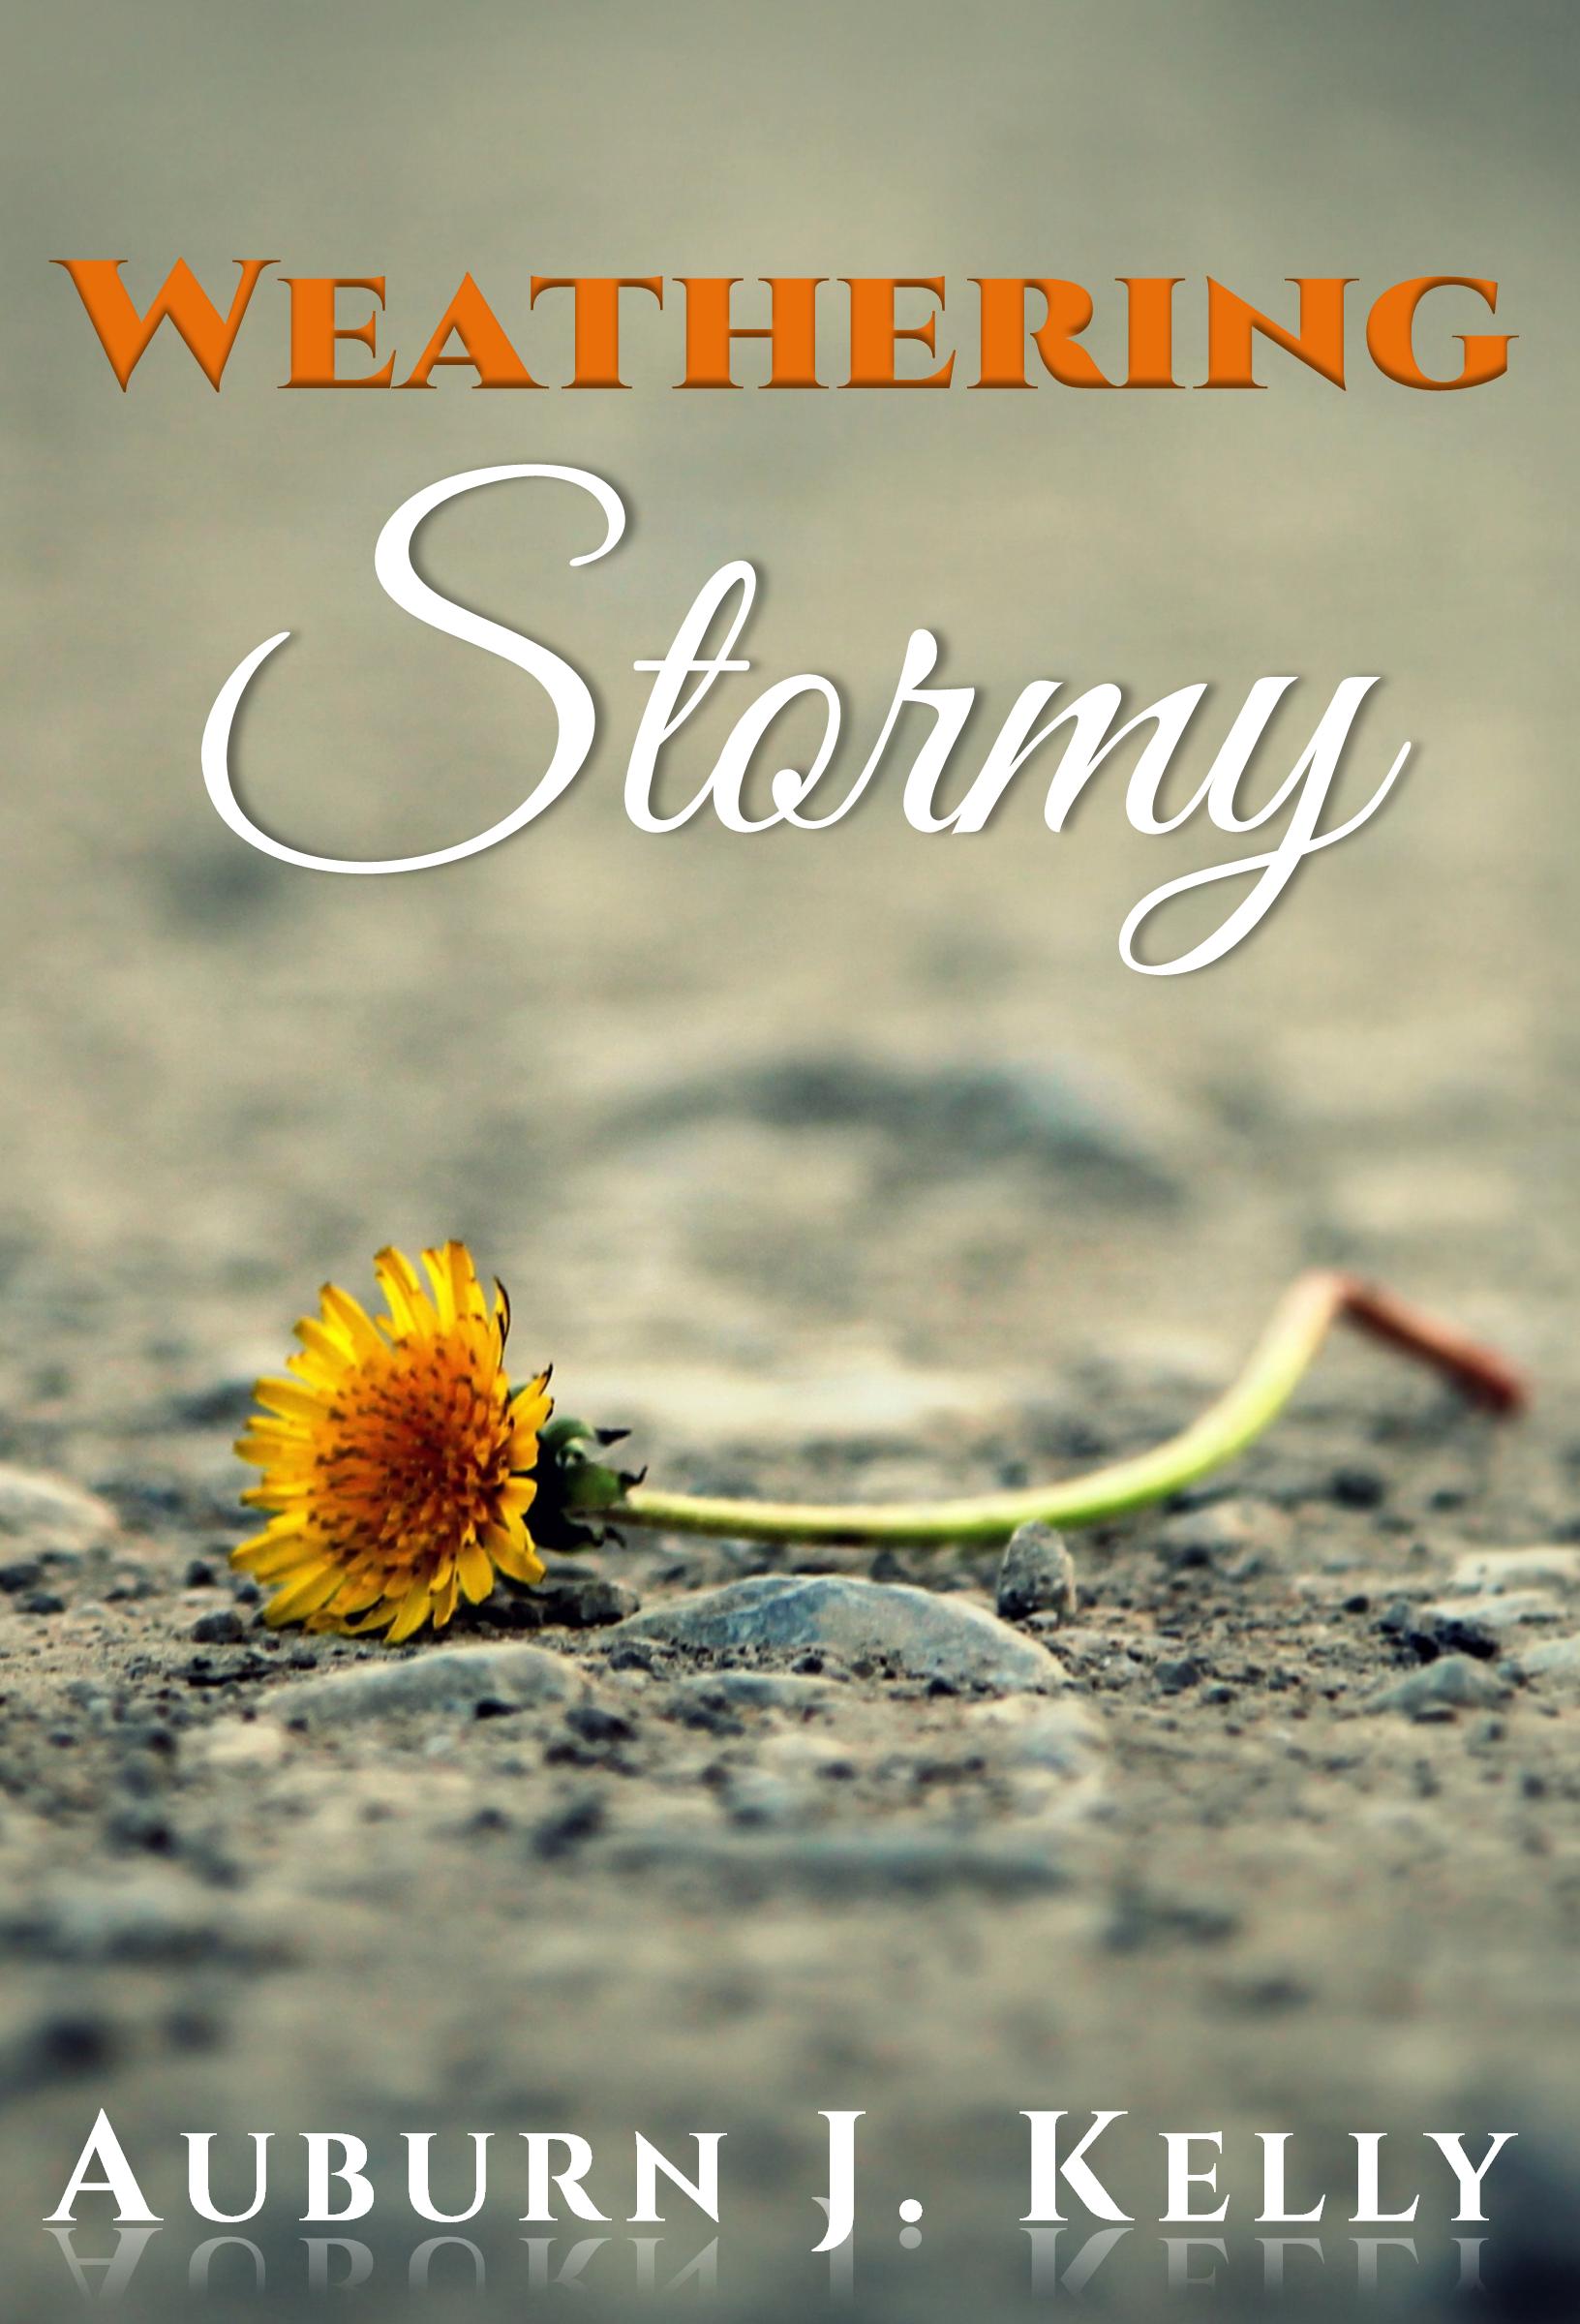 Weathering Stormy By Auburn J Kelly